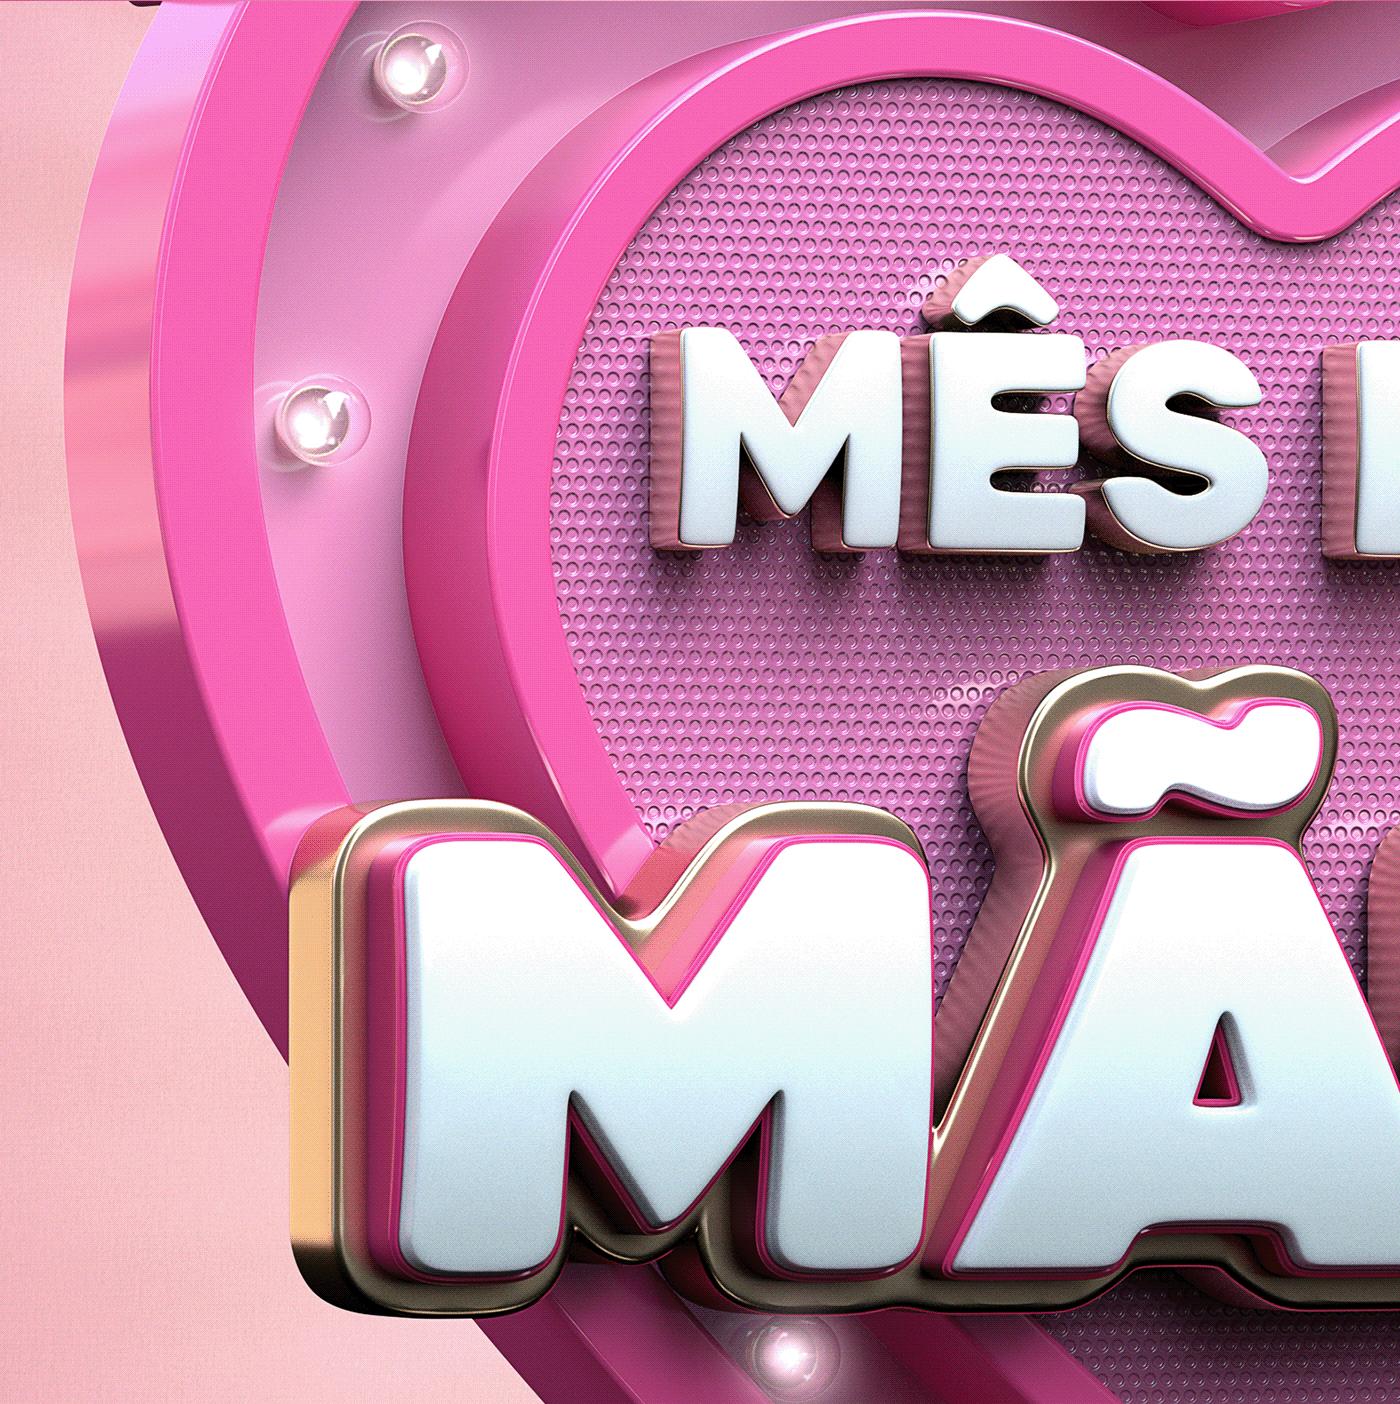 3D cinema 4d dia das mães mês das mães selo 3d selo varejo Selos 3D Social media 3d varejo